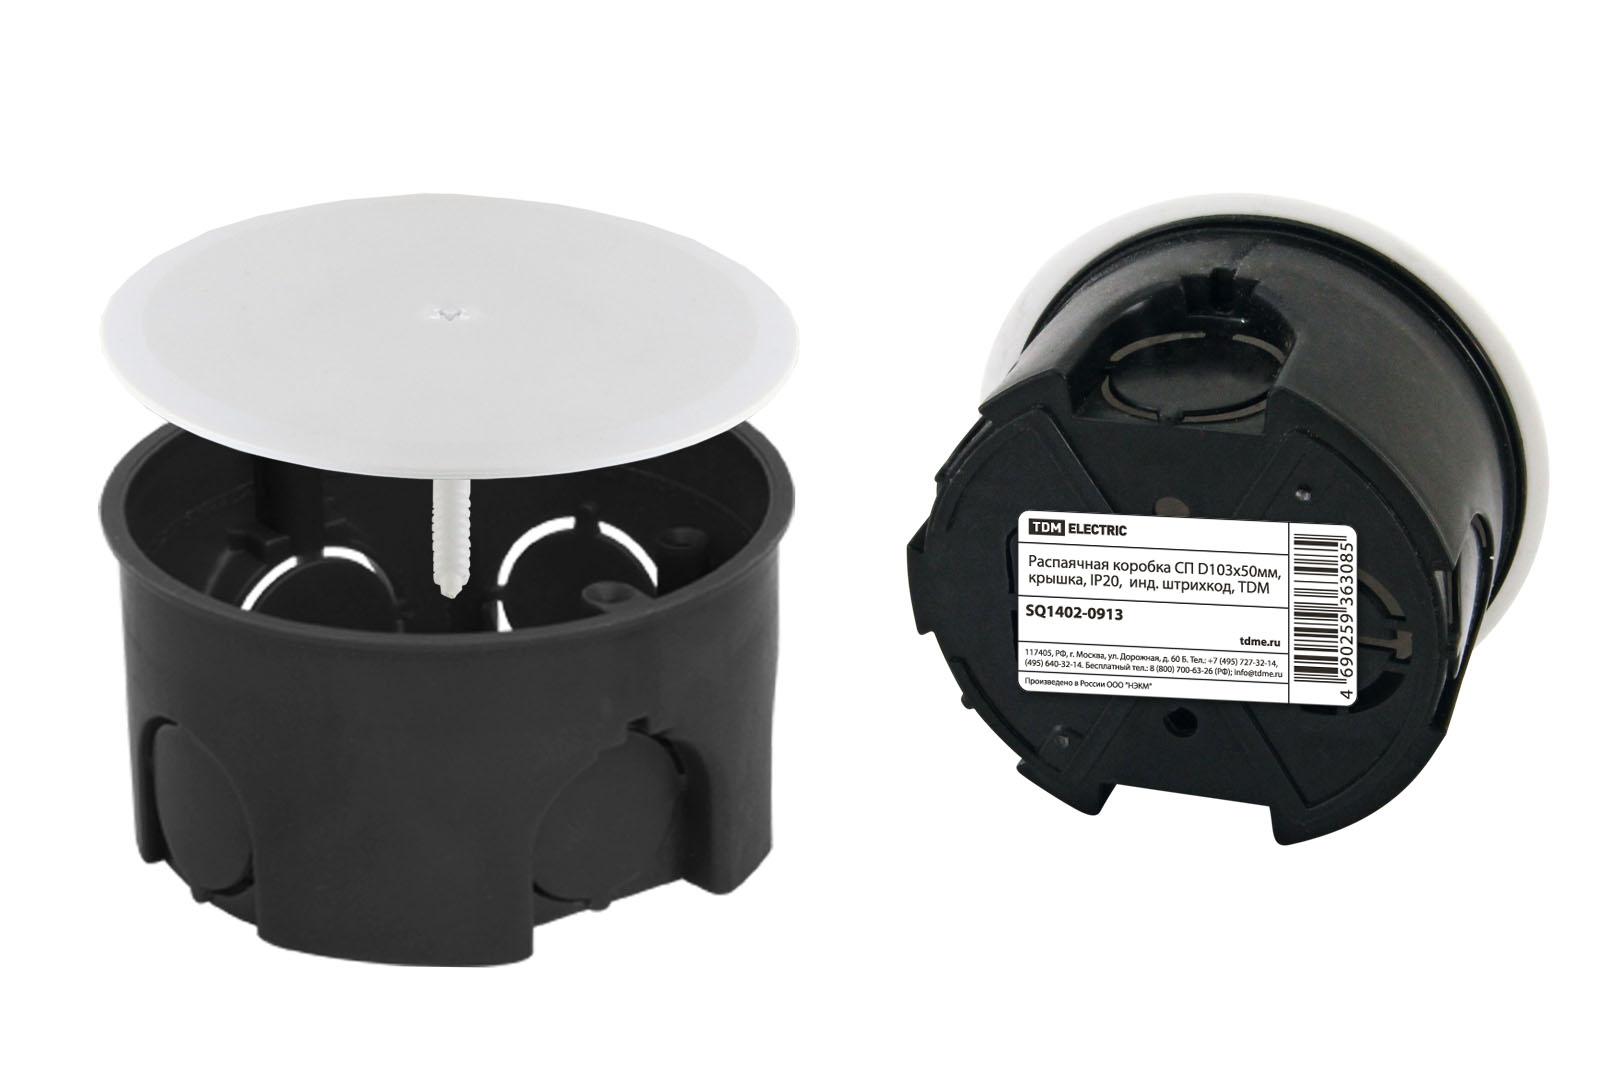 Фото Распаячная коробка СП D103х50мм, крышка, IP20, инд. штрихкод, TDM {SQ1402-0913}